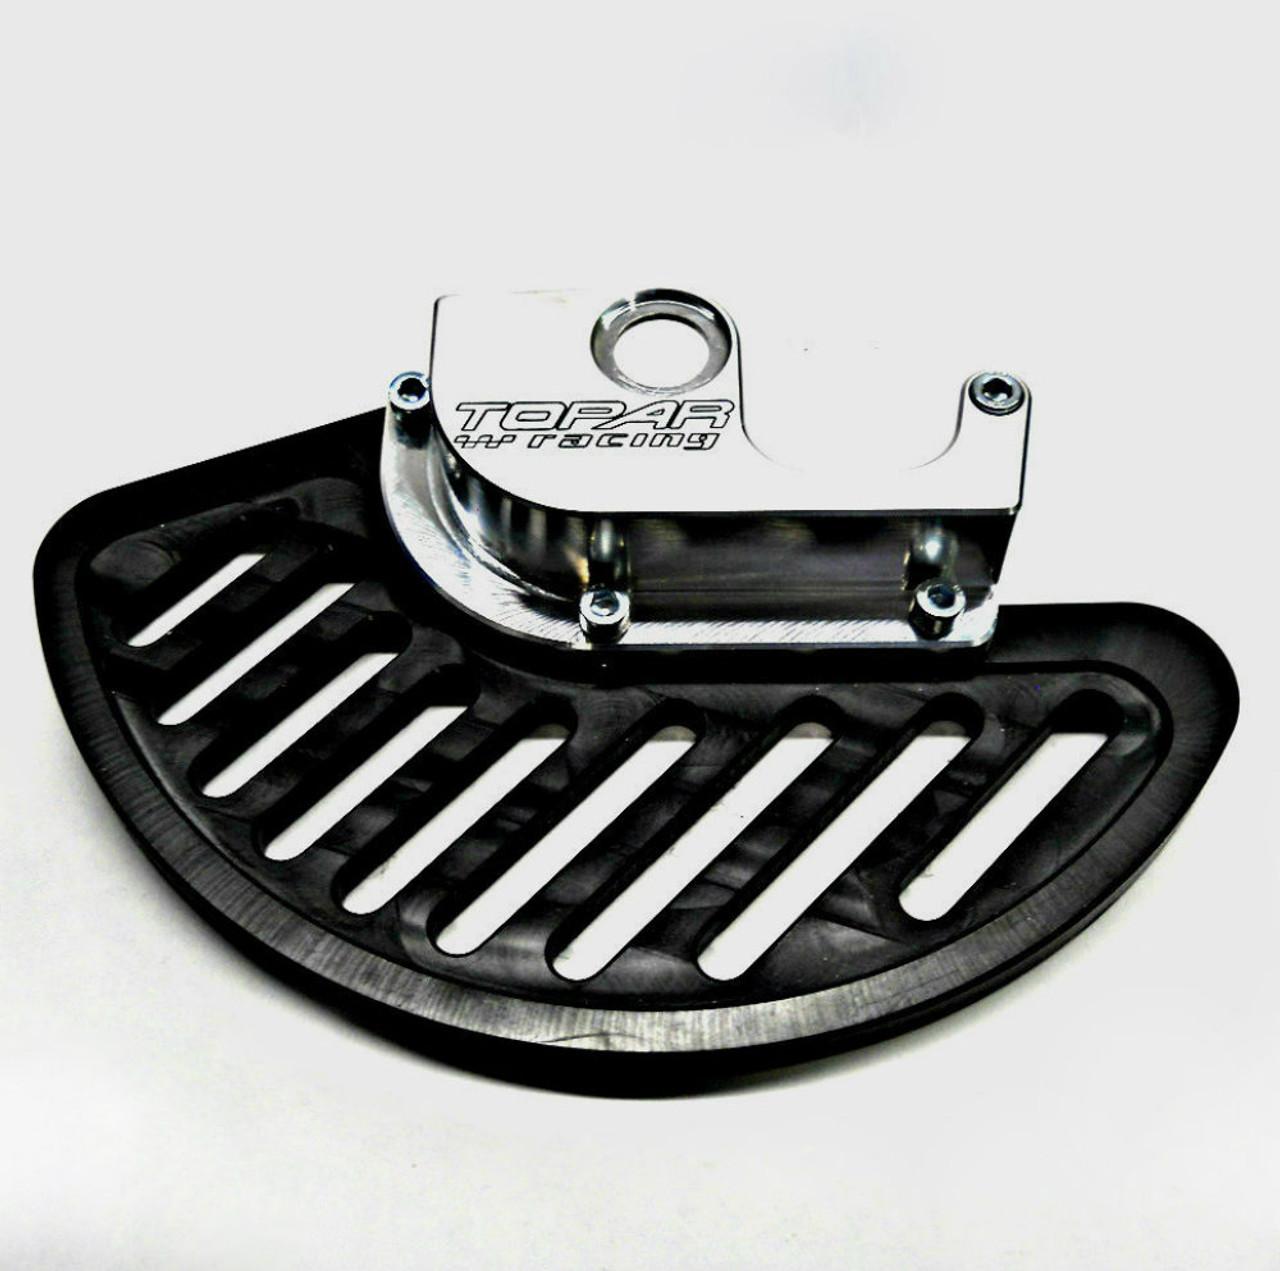 Topar Racing Front Brake Rotor Disc Guard for 2004-2005 KAWASAKI KX125, KX250F; 2004-2006 KX250 (shown with UHMW Plastic fin)